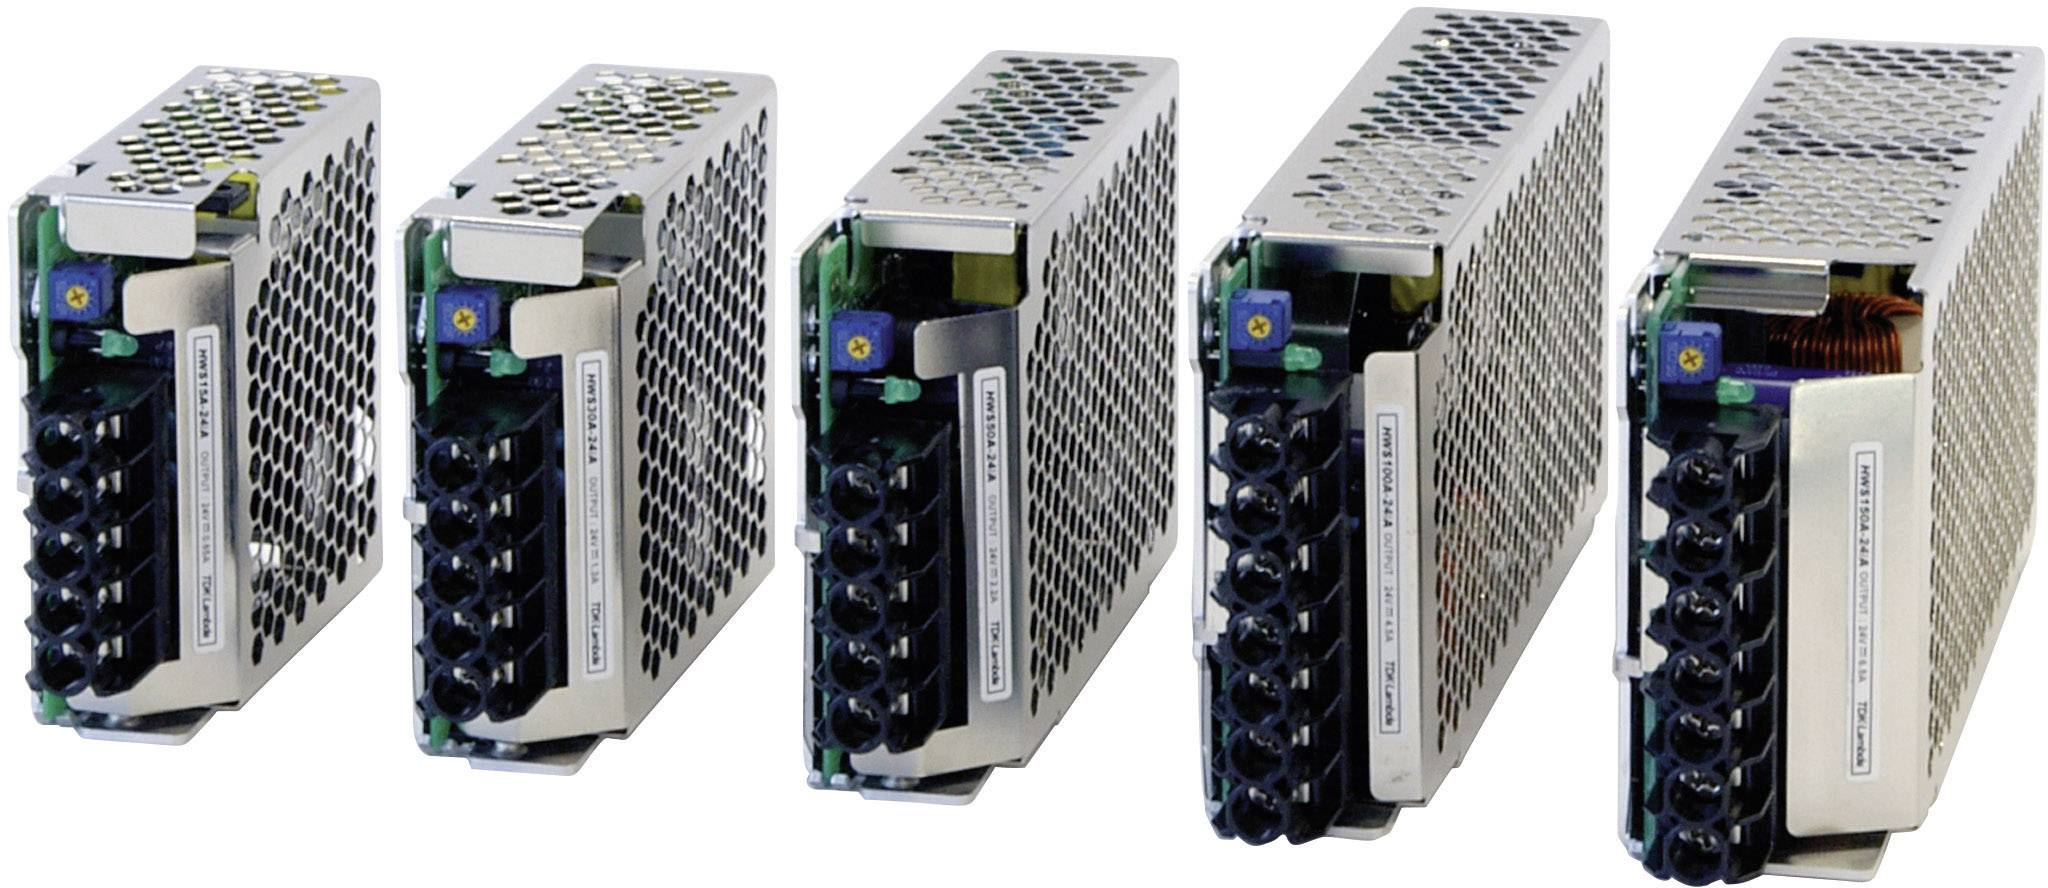 Zabudovateľný napájací zdroj TDK-Lambda HWS-100A-12/A, 12 V, 102 W